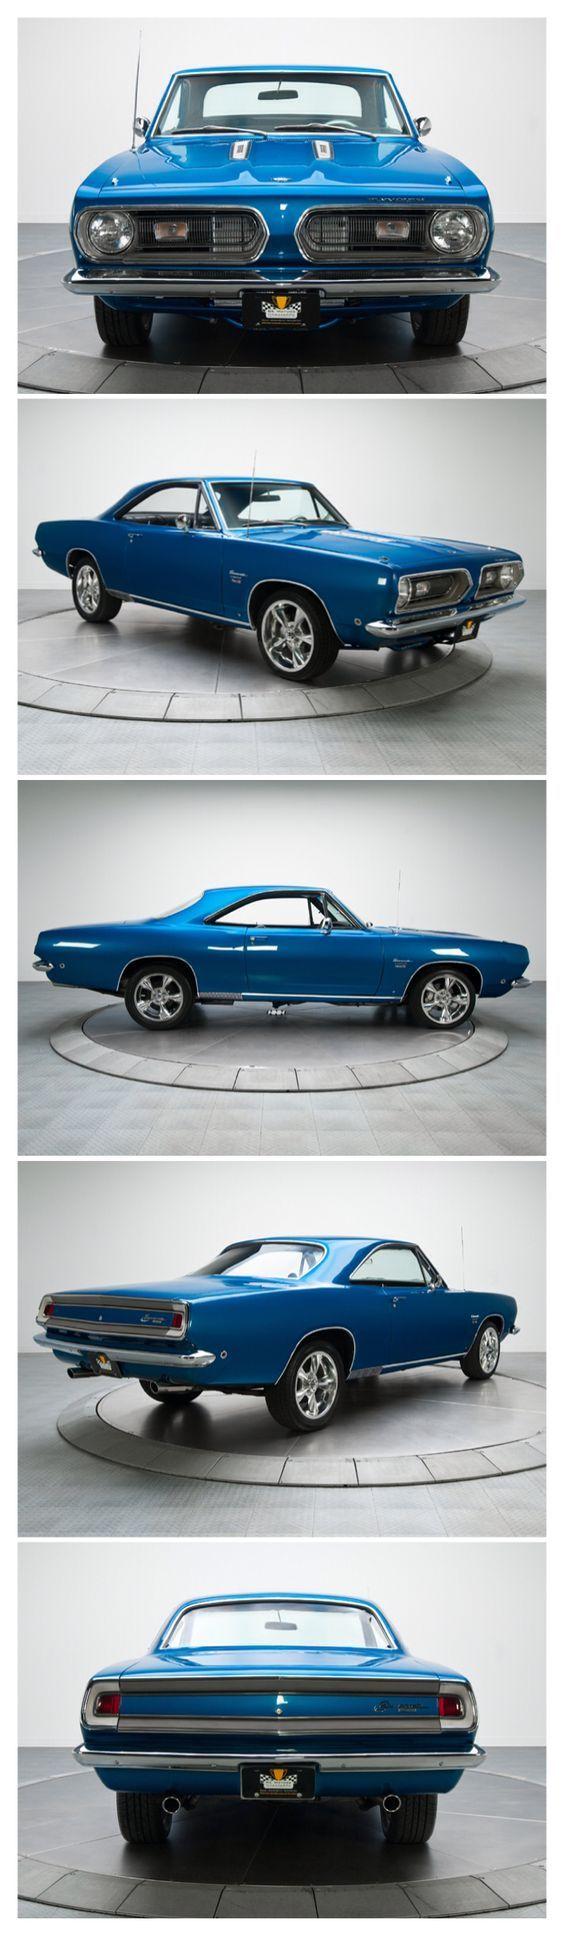 1968 Plymouth Barracuda: